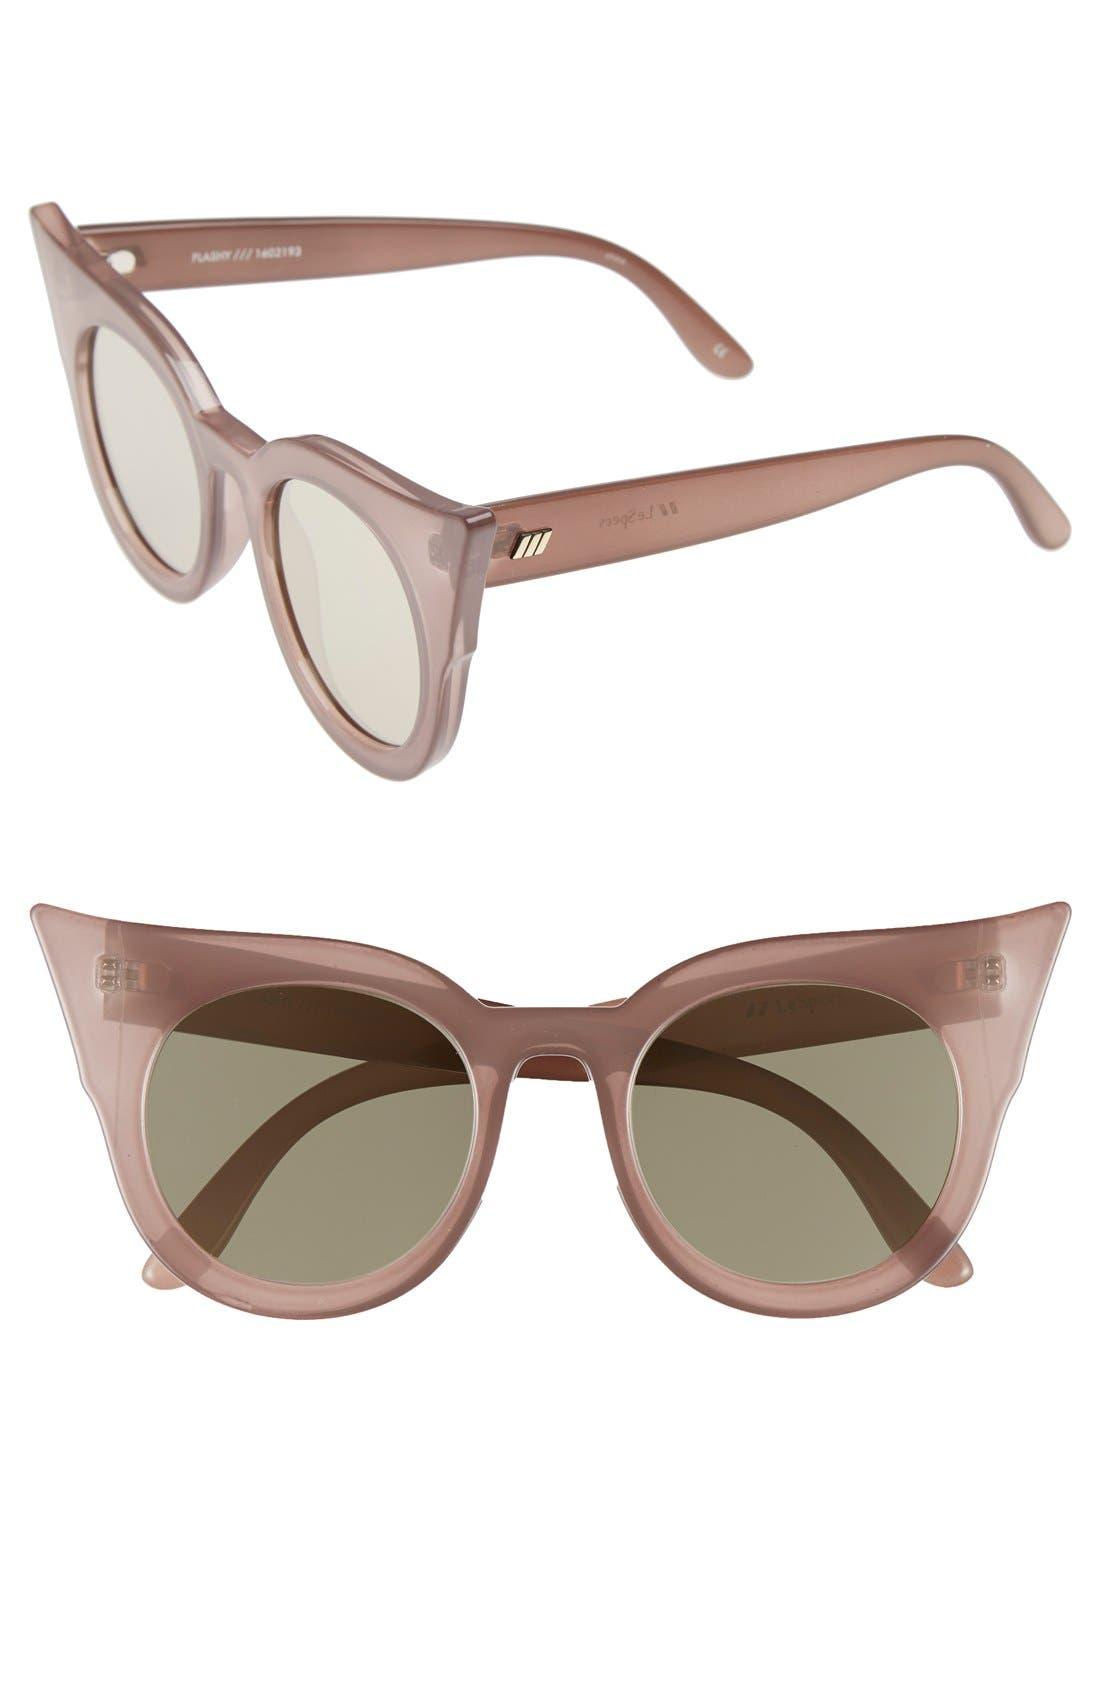 Main Image - Le Specs 'Flashy' 51mm Sunglasses